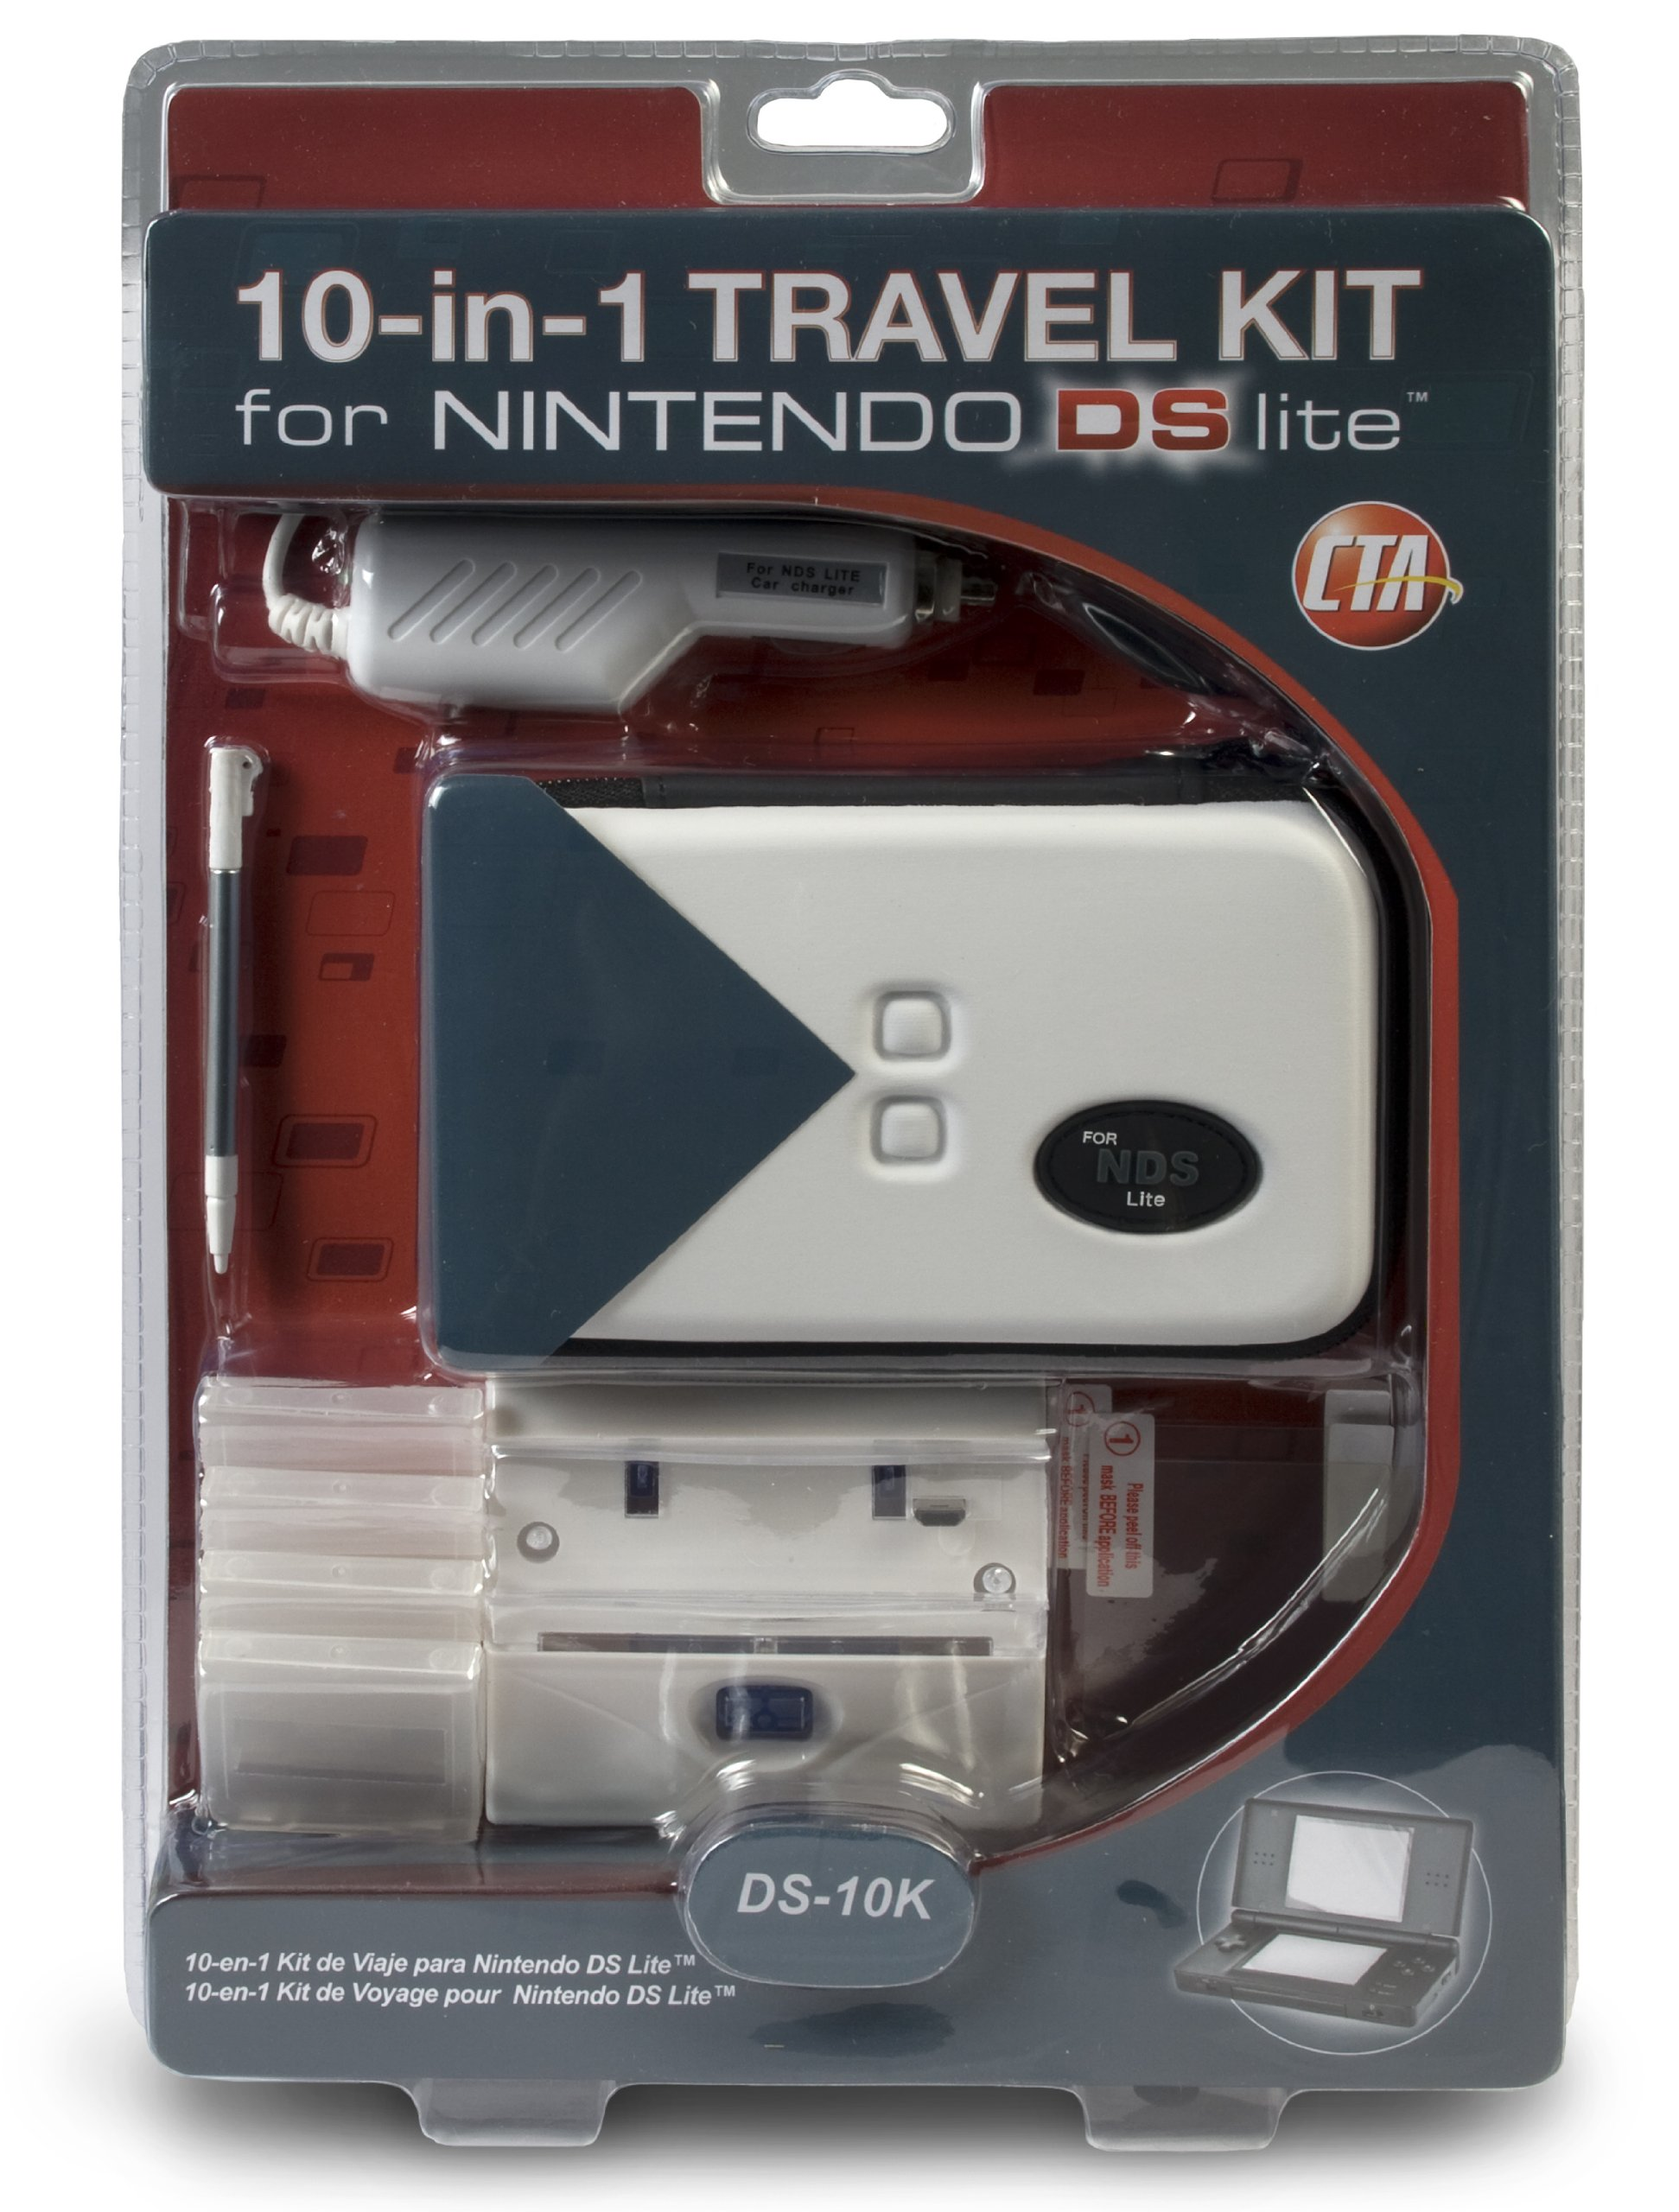 DS Lite 10-in-1 Travel Kit